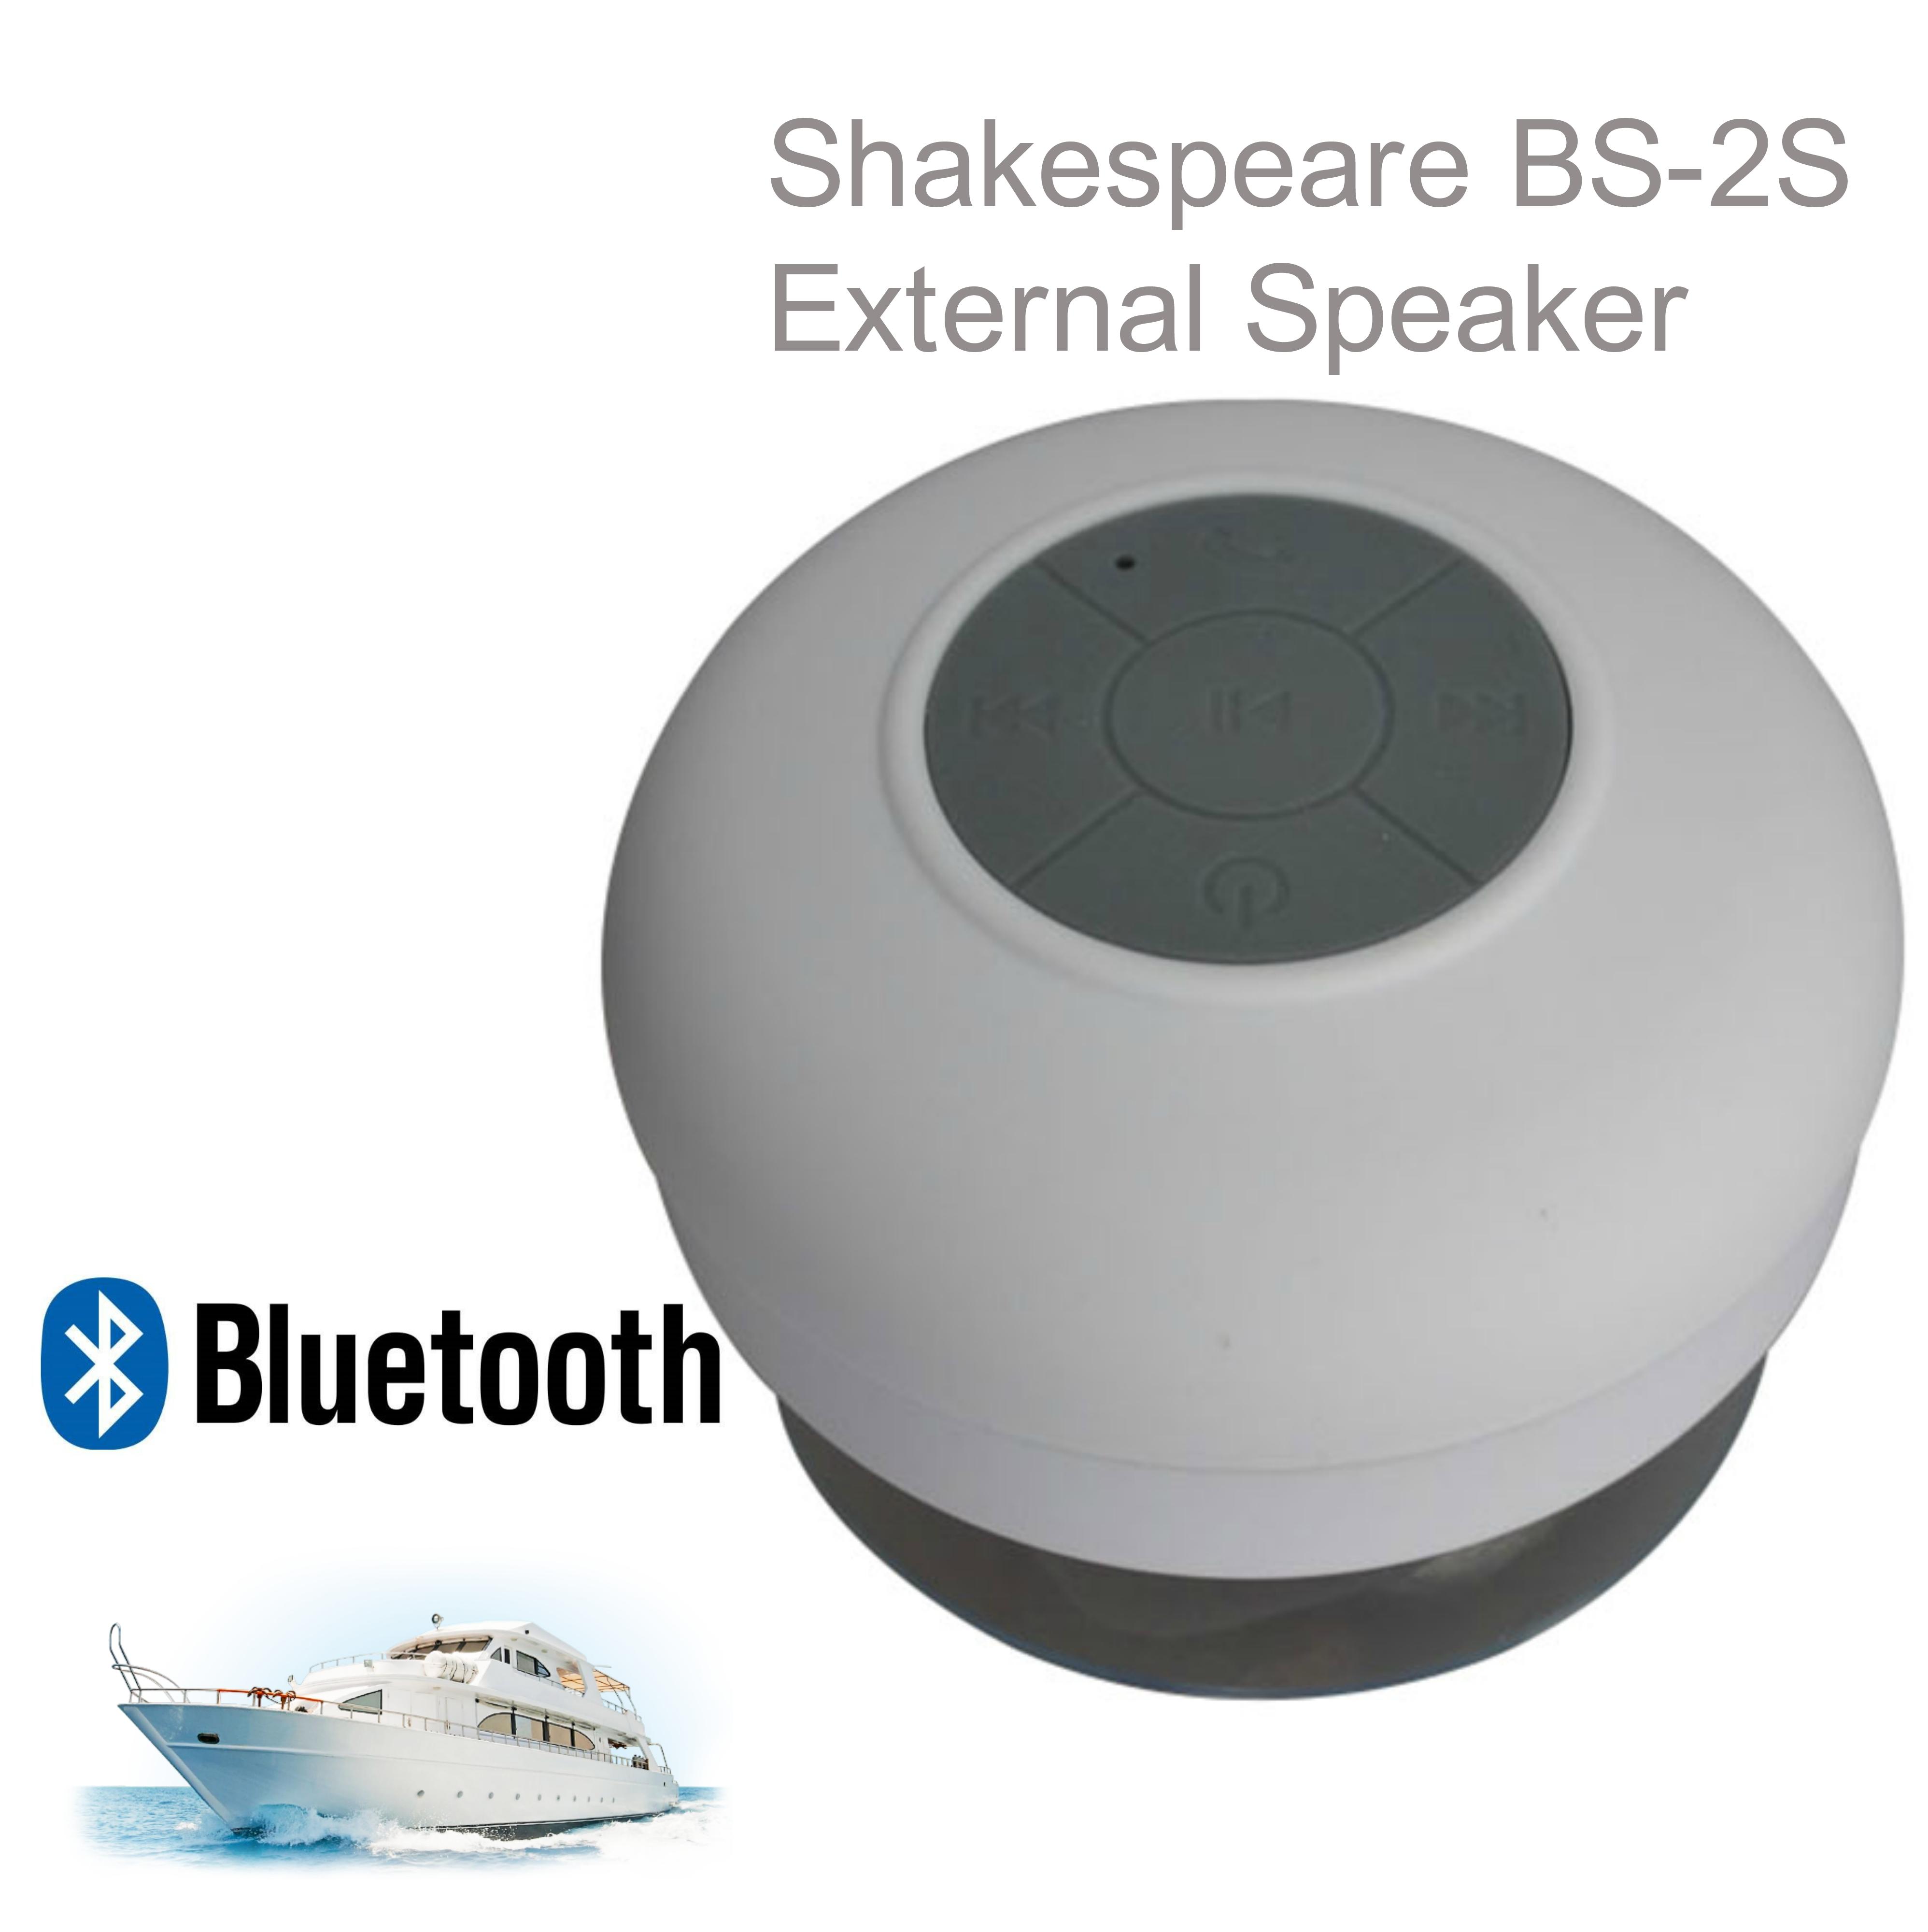 Shakespeare-BS-2S|5.71cm External Speaker|Waterproof|Bluetooth|Ideal For Marine